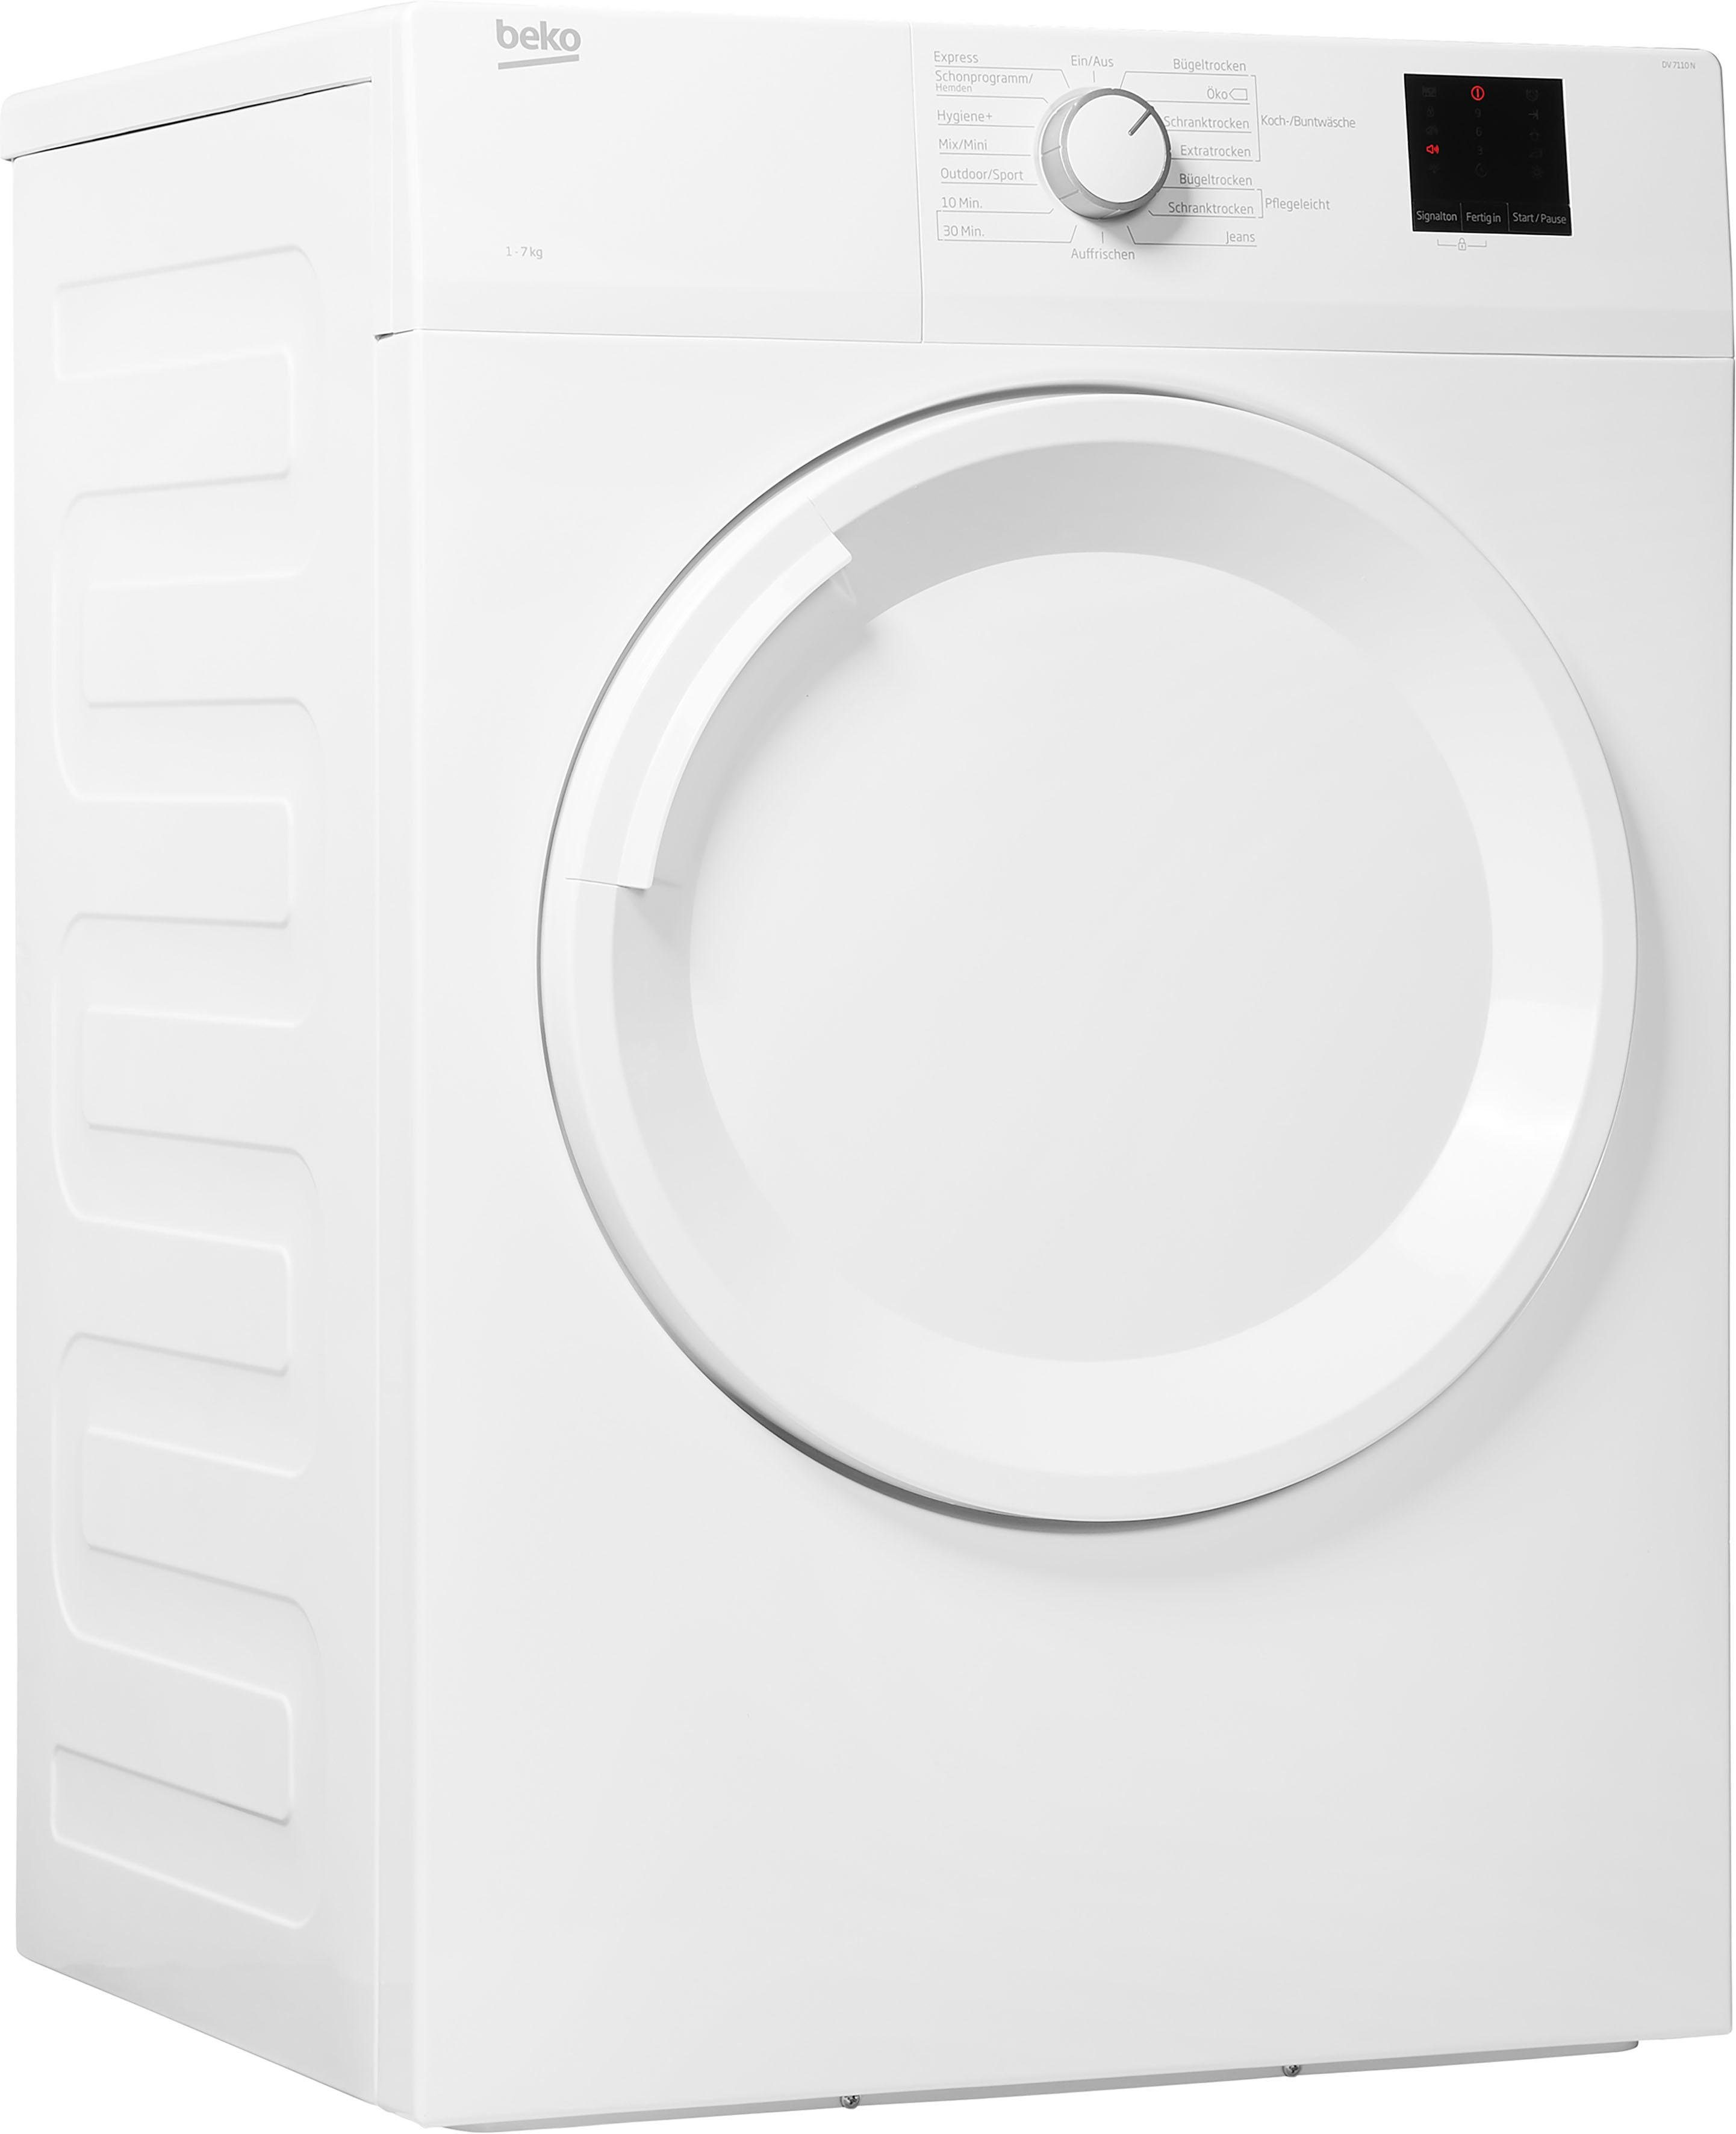 BEKO Ablufttrockner DV7110N, 7 kg   Bad > Waschmaschinen und Trockner > Ablufttrockner   Beko